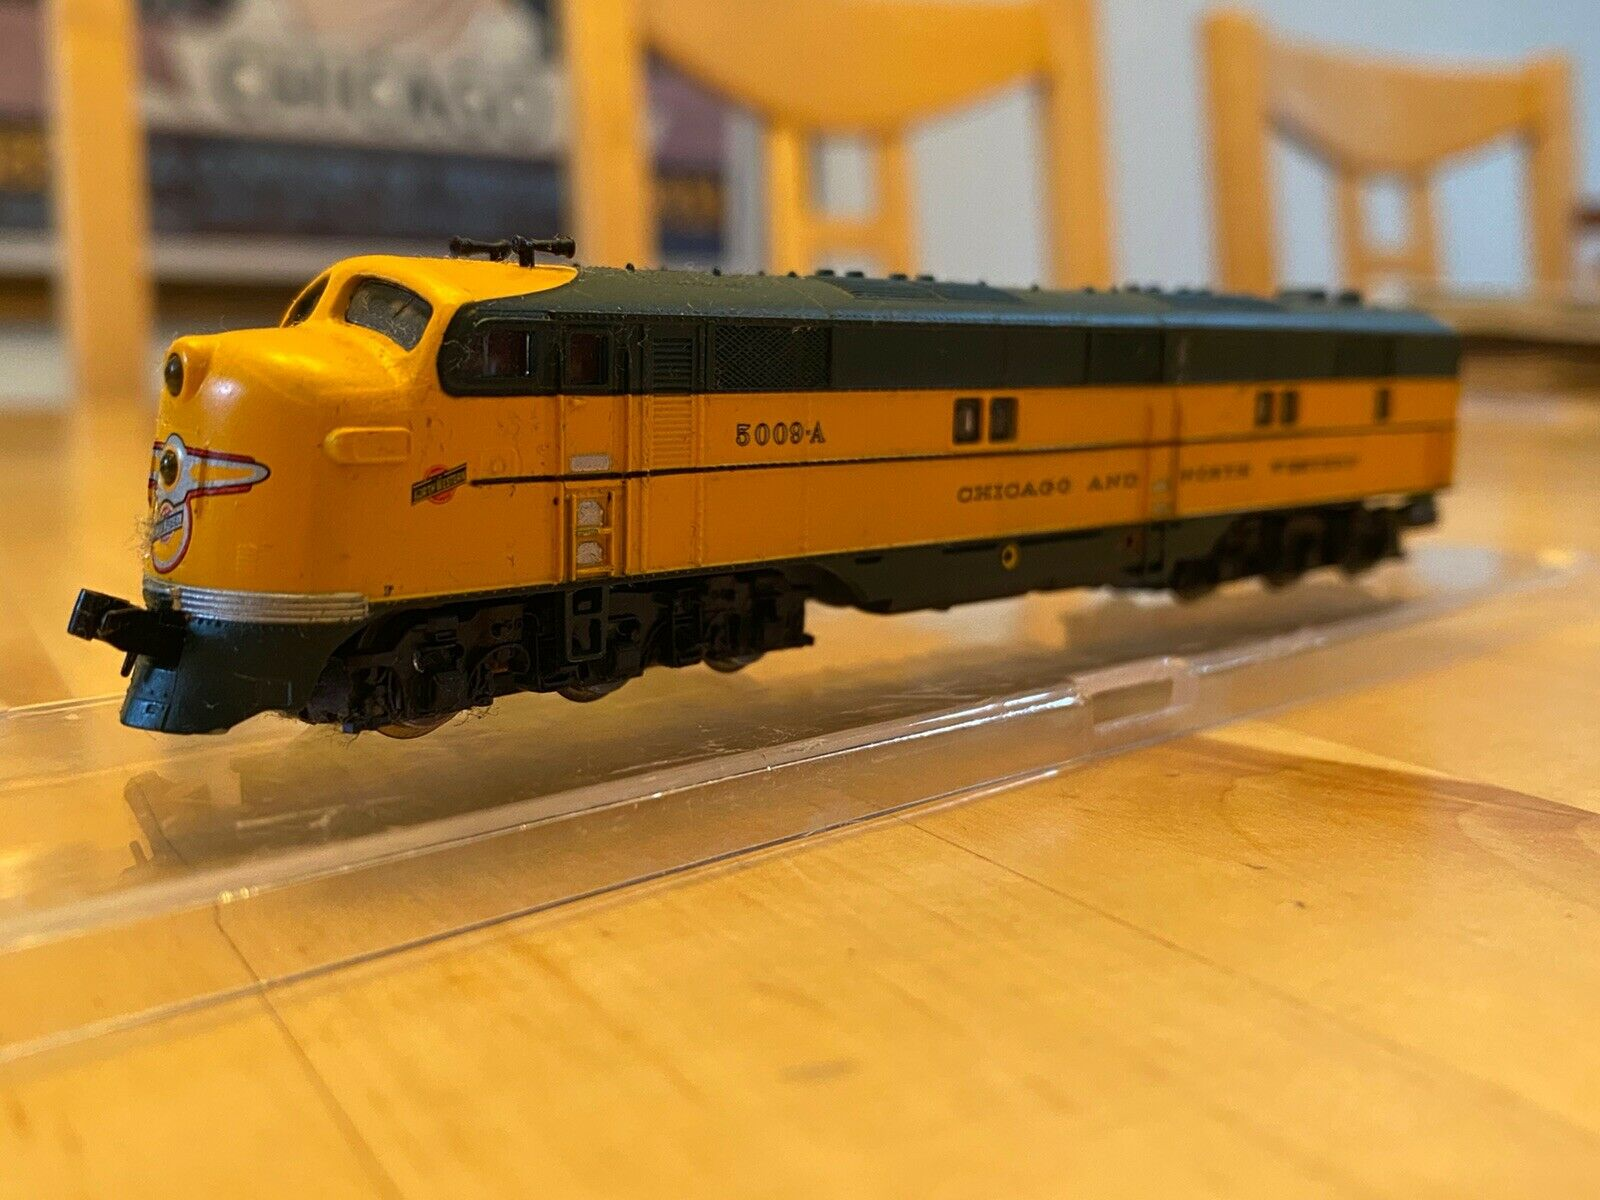 N Scale - Life-Like - 7005 - Locomotive, Diesel, EMD E7 - Chicago & North Western - 5009A